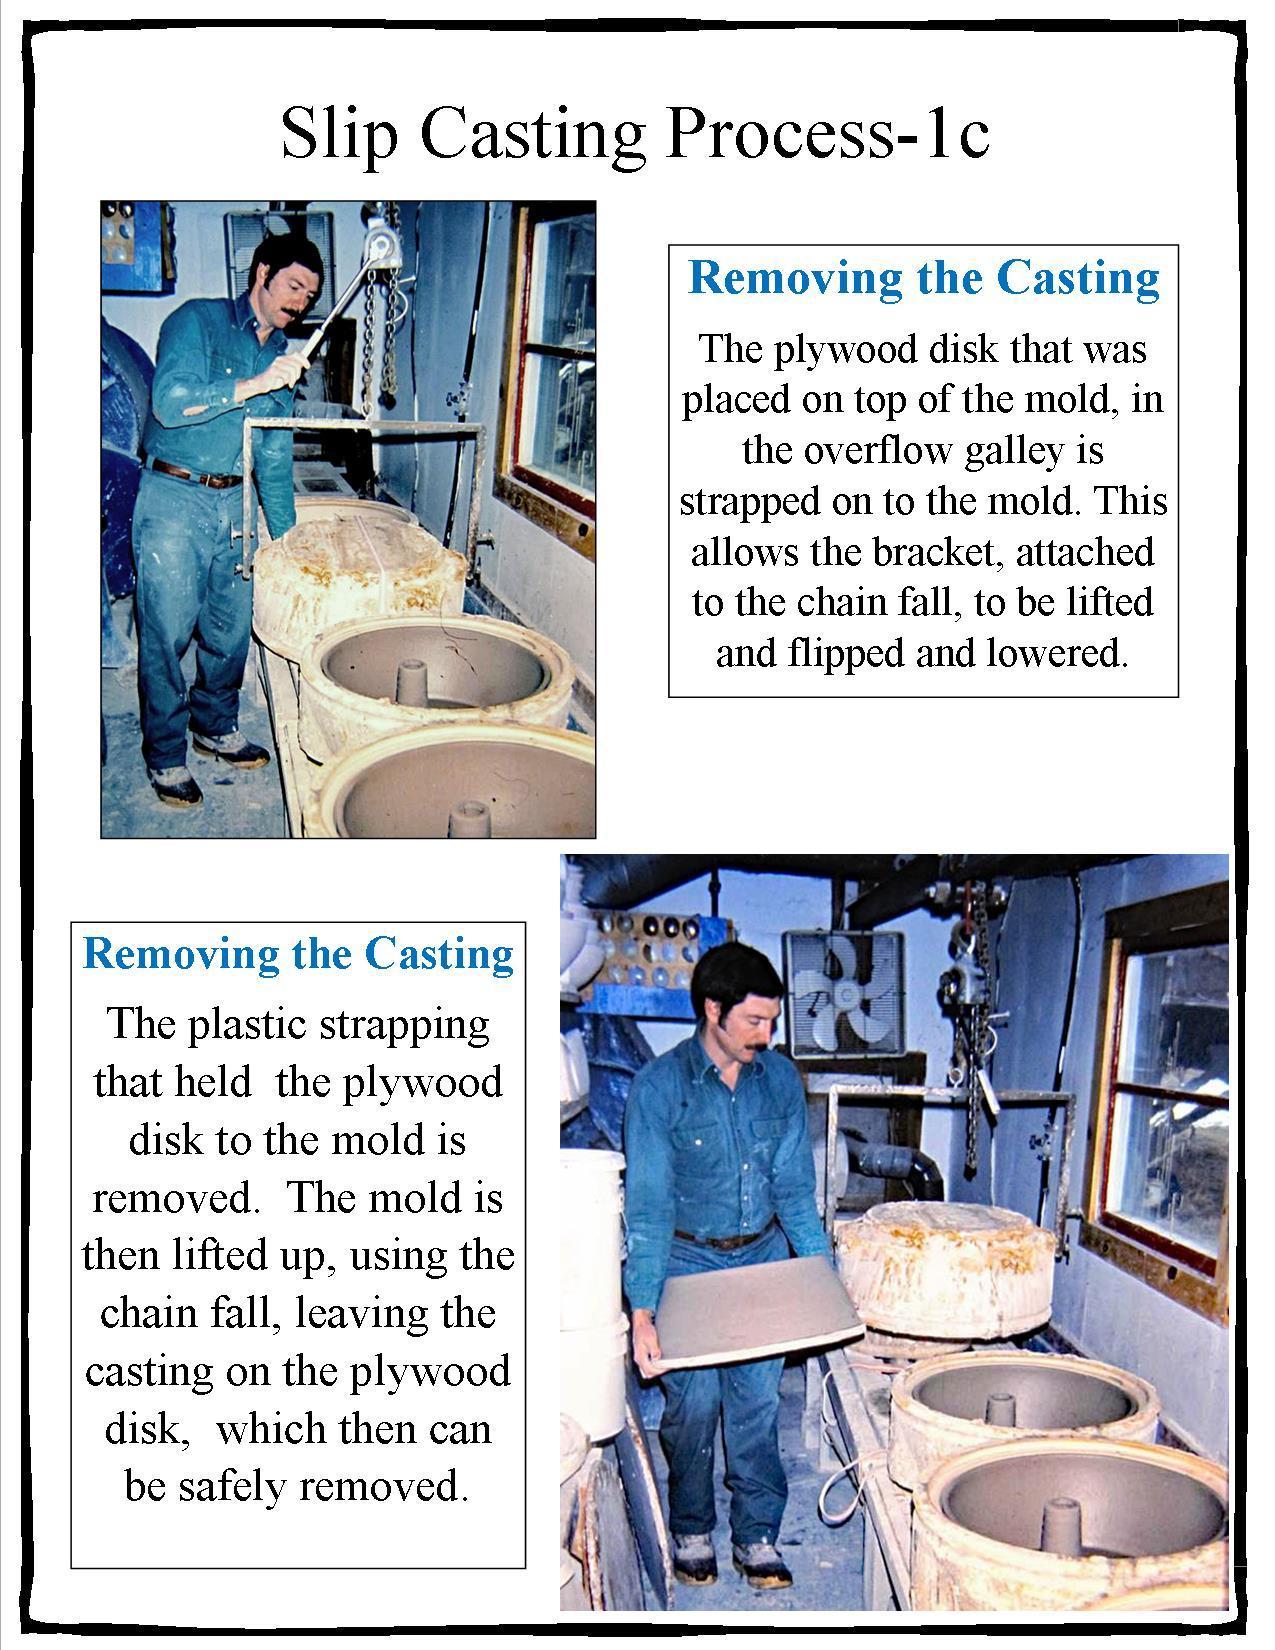 Slip Casting Process-1c